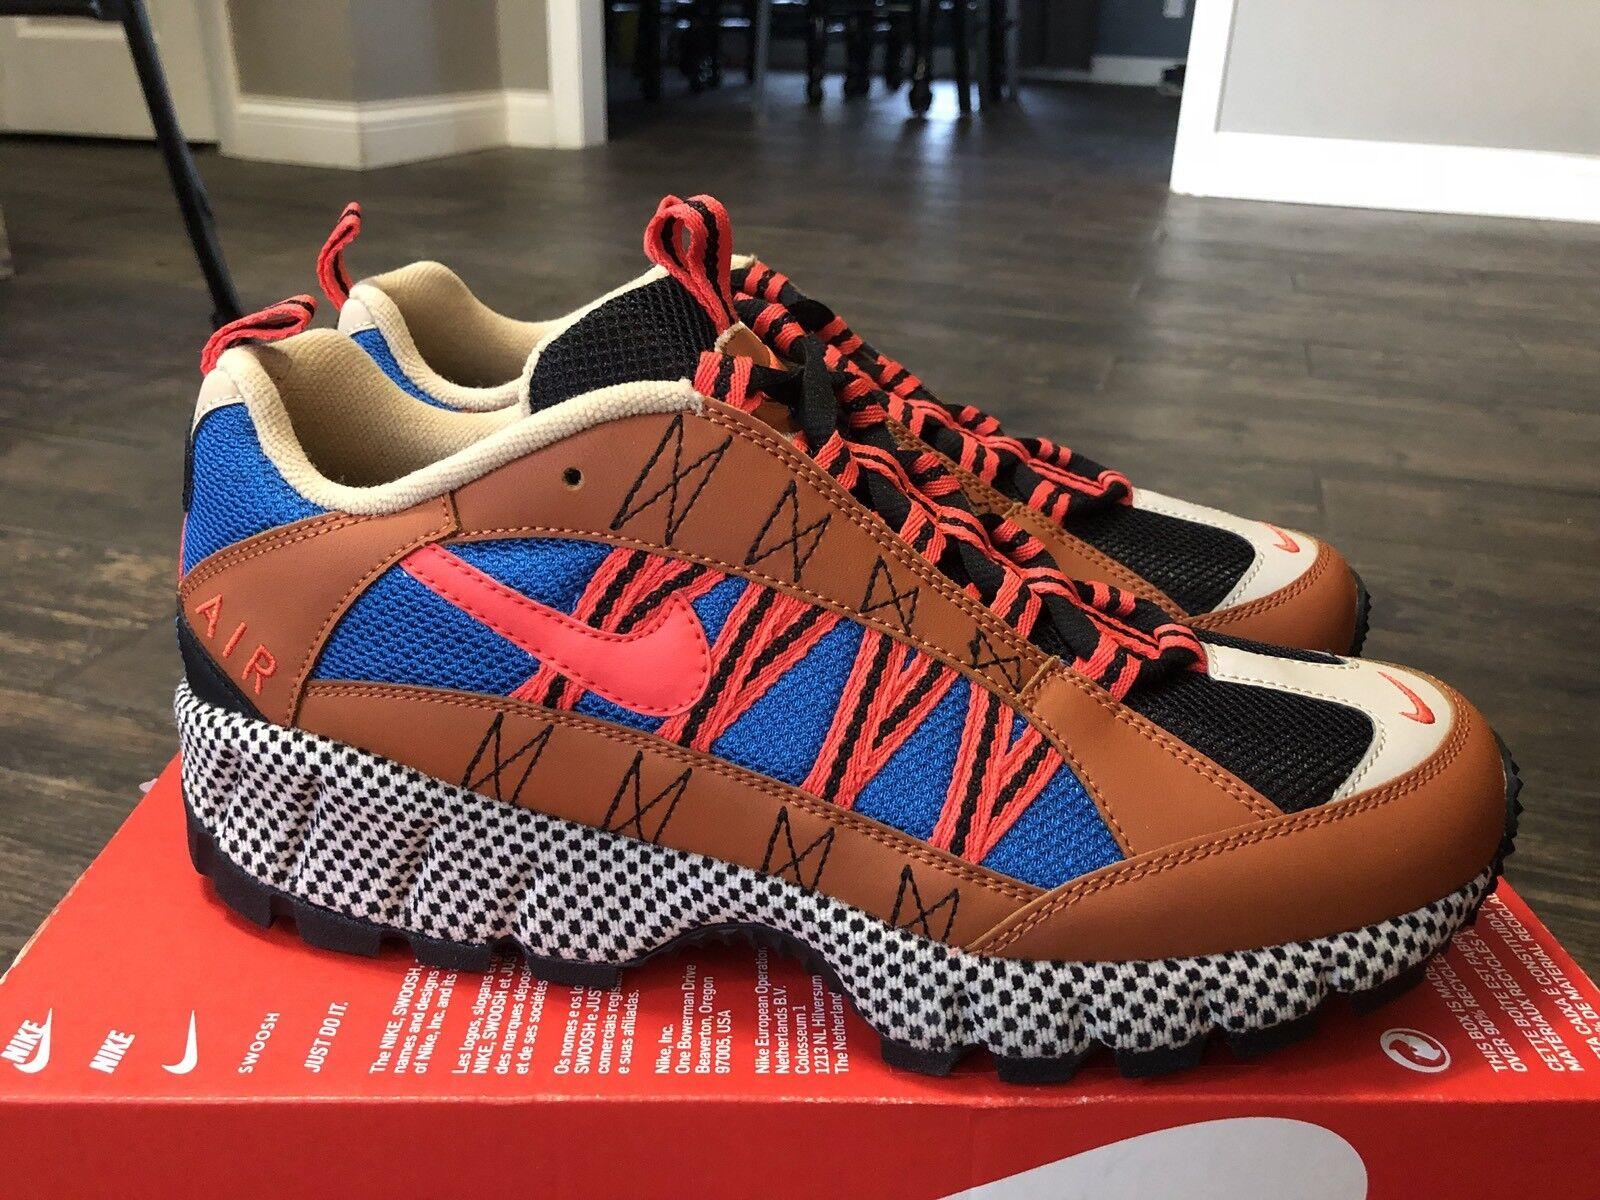 Men's Nike Humara 17 QS  Outdoors   Size-10 Orange Blue Tan Grey (AO3297 200)